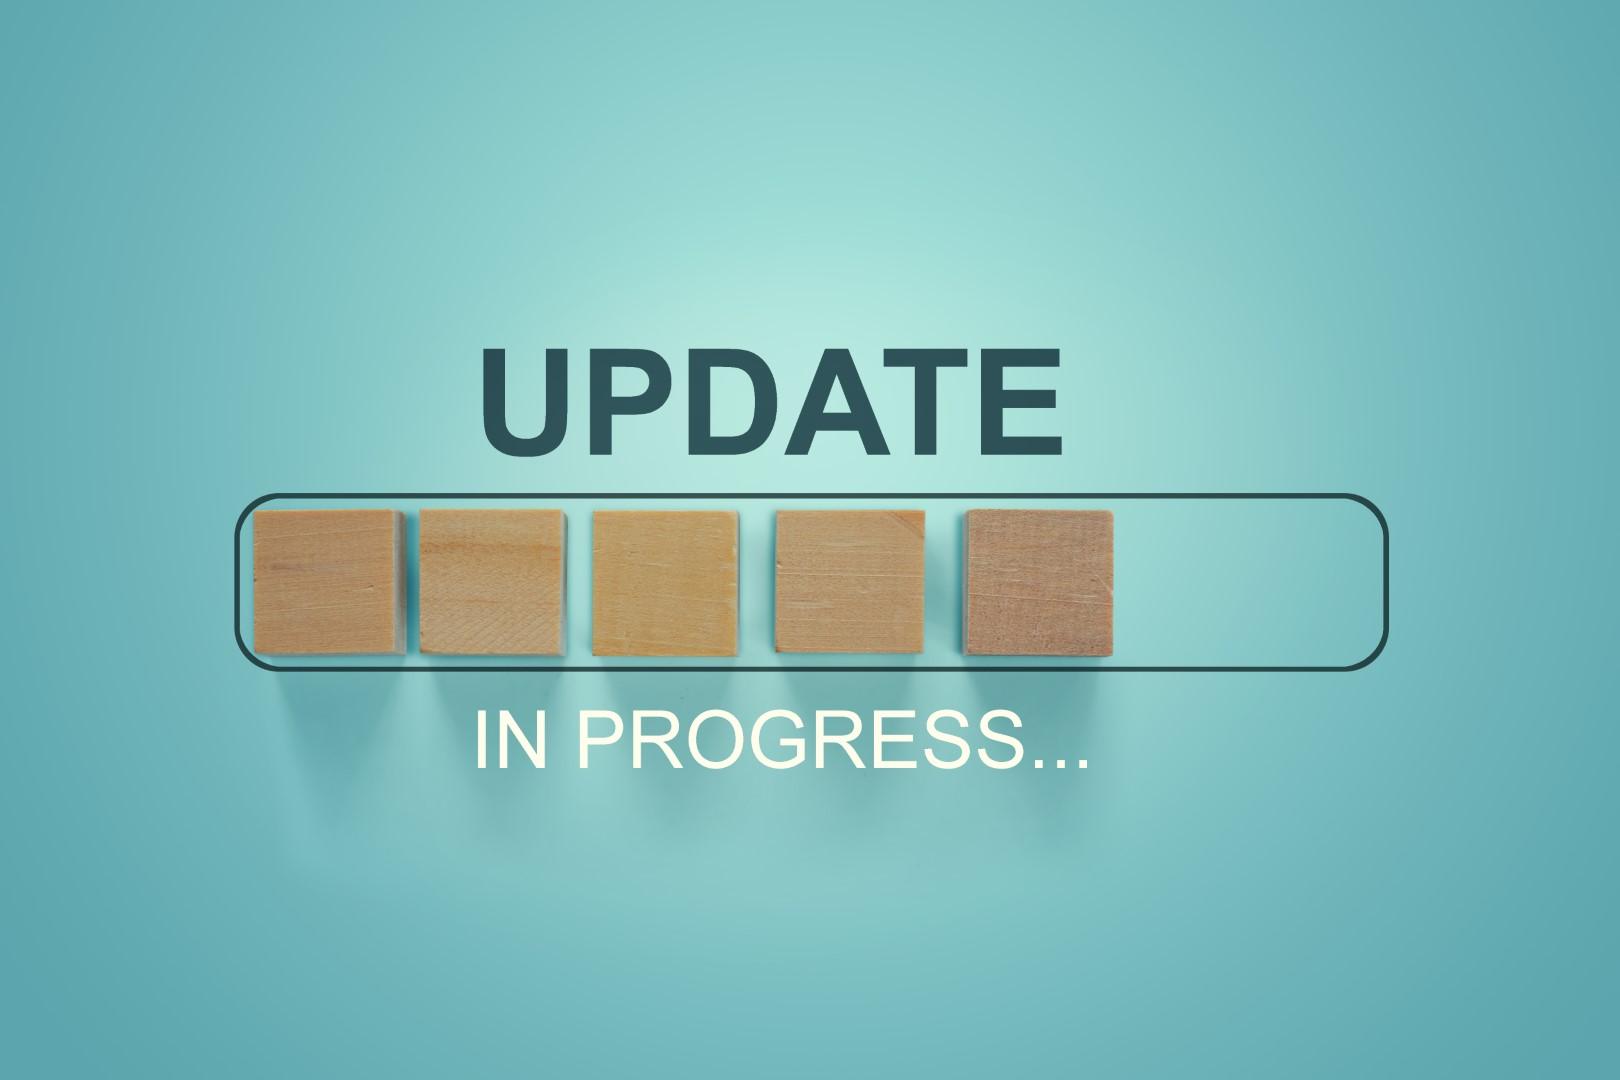 Updates, updates, updates